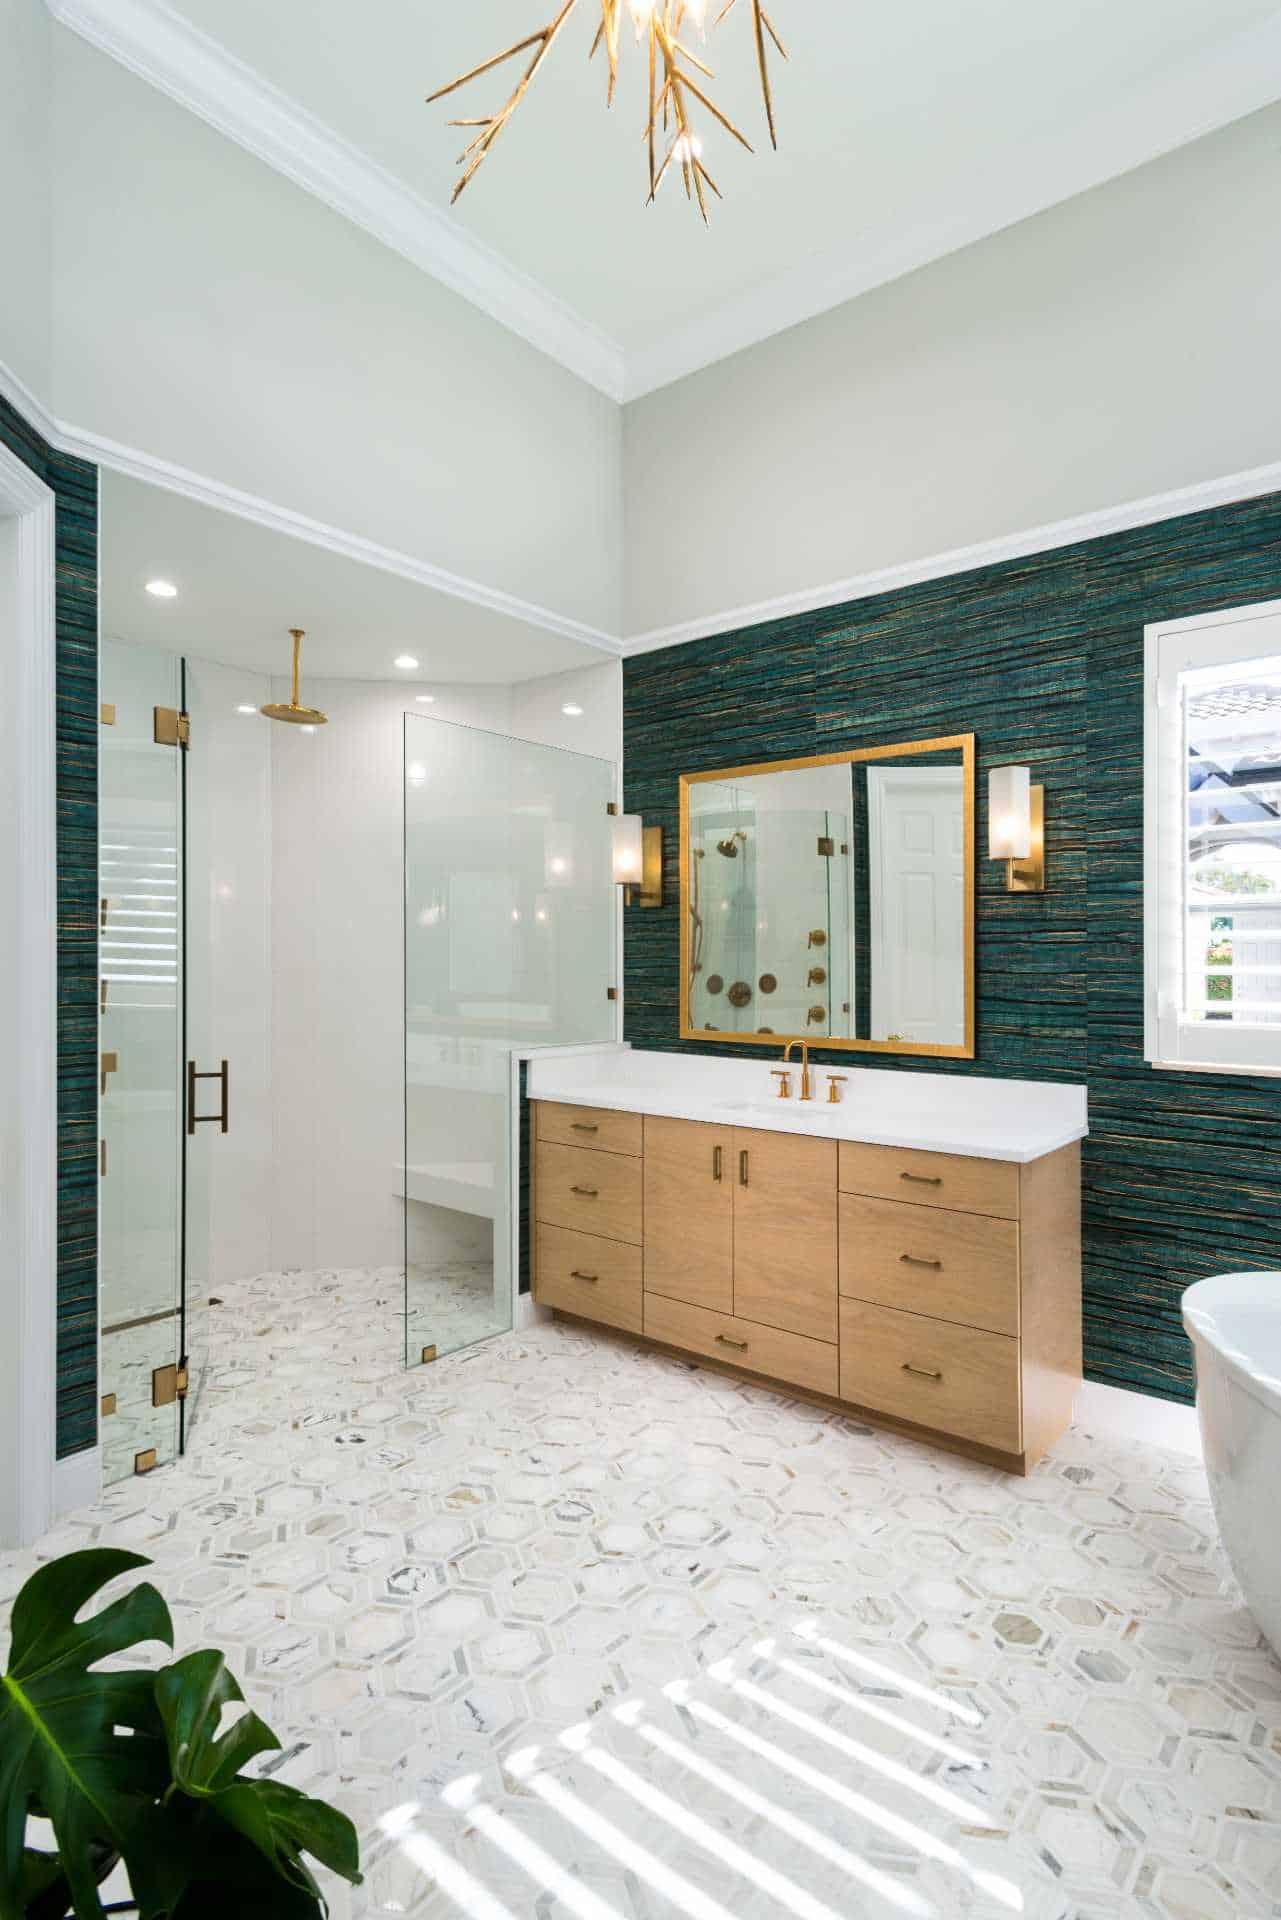 Full master bathroom with walk-in shower, bathtub, and sink